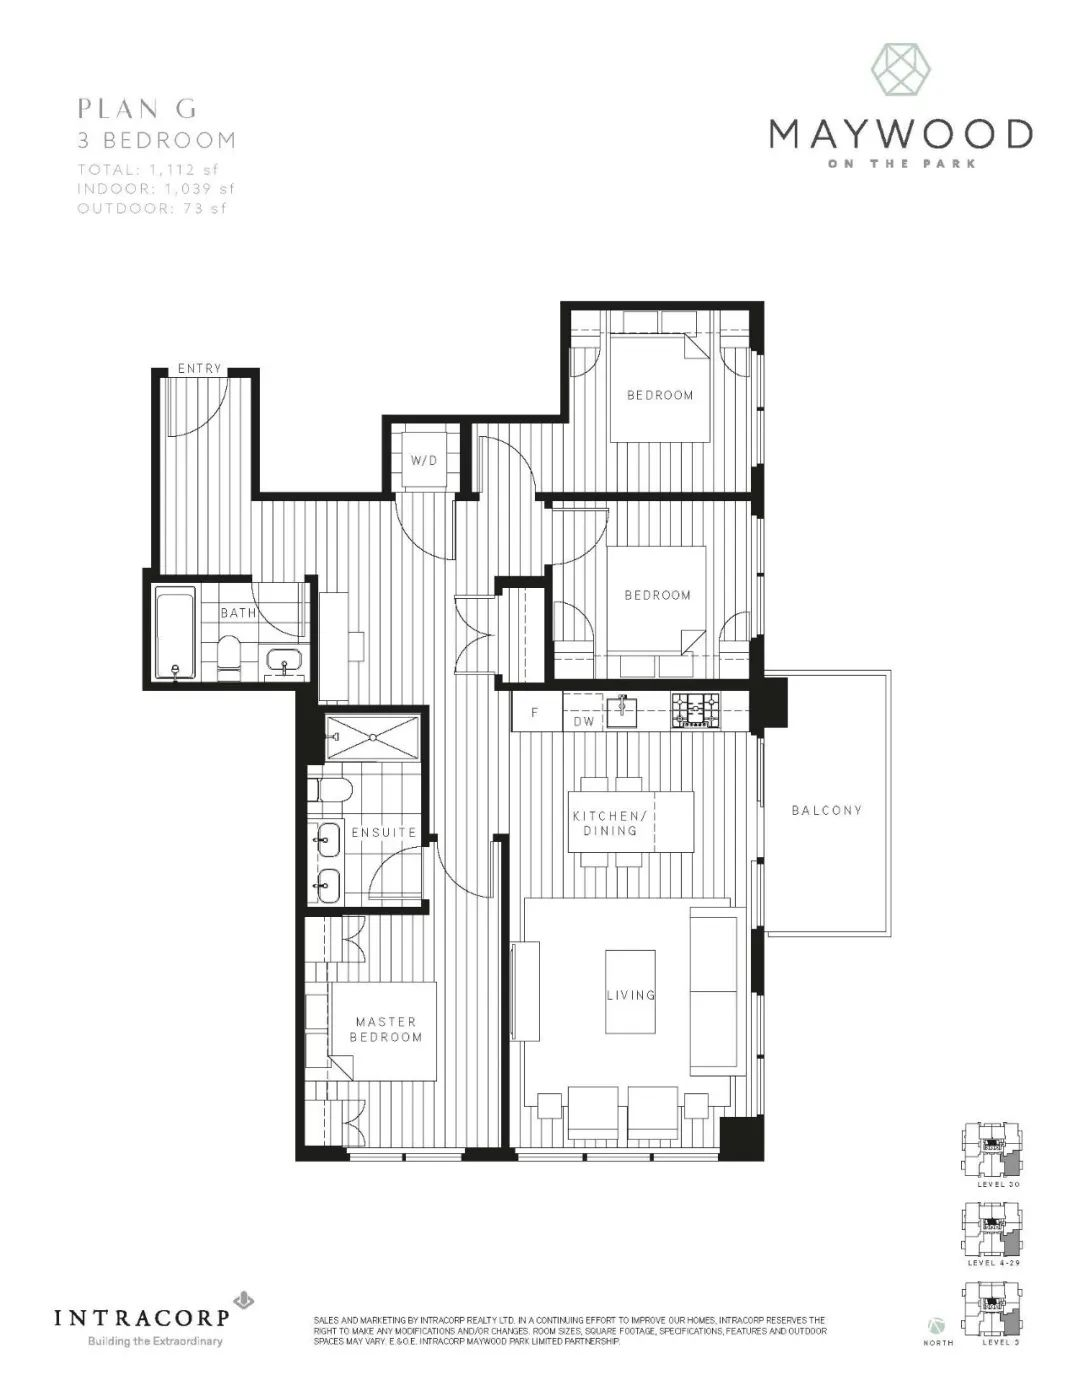 Metrotown黄金地段,低至$47.99万入住园畔高层单位,开启绿色人居生活